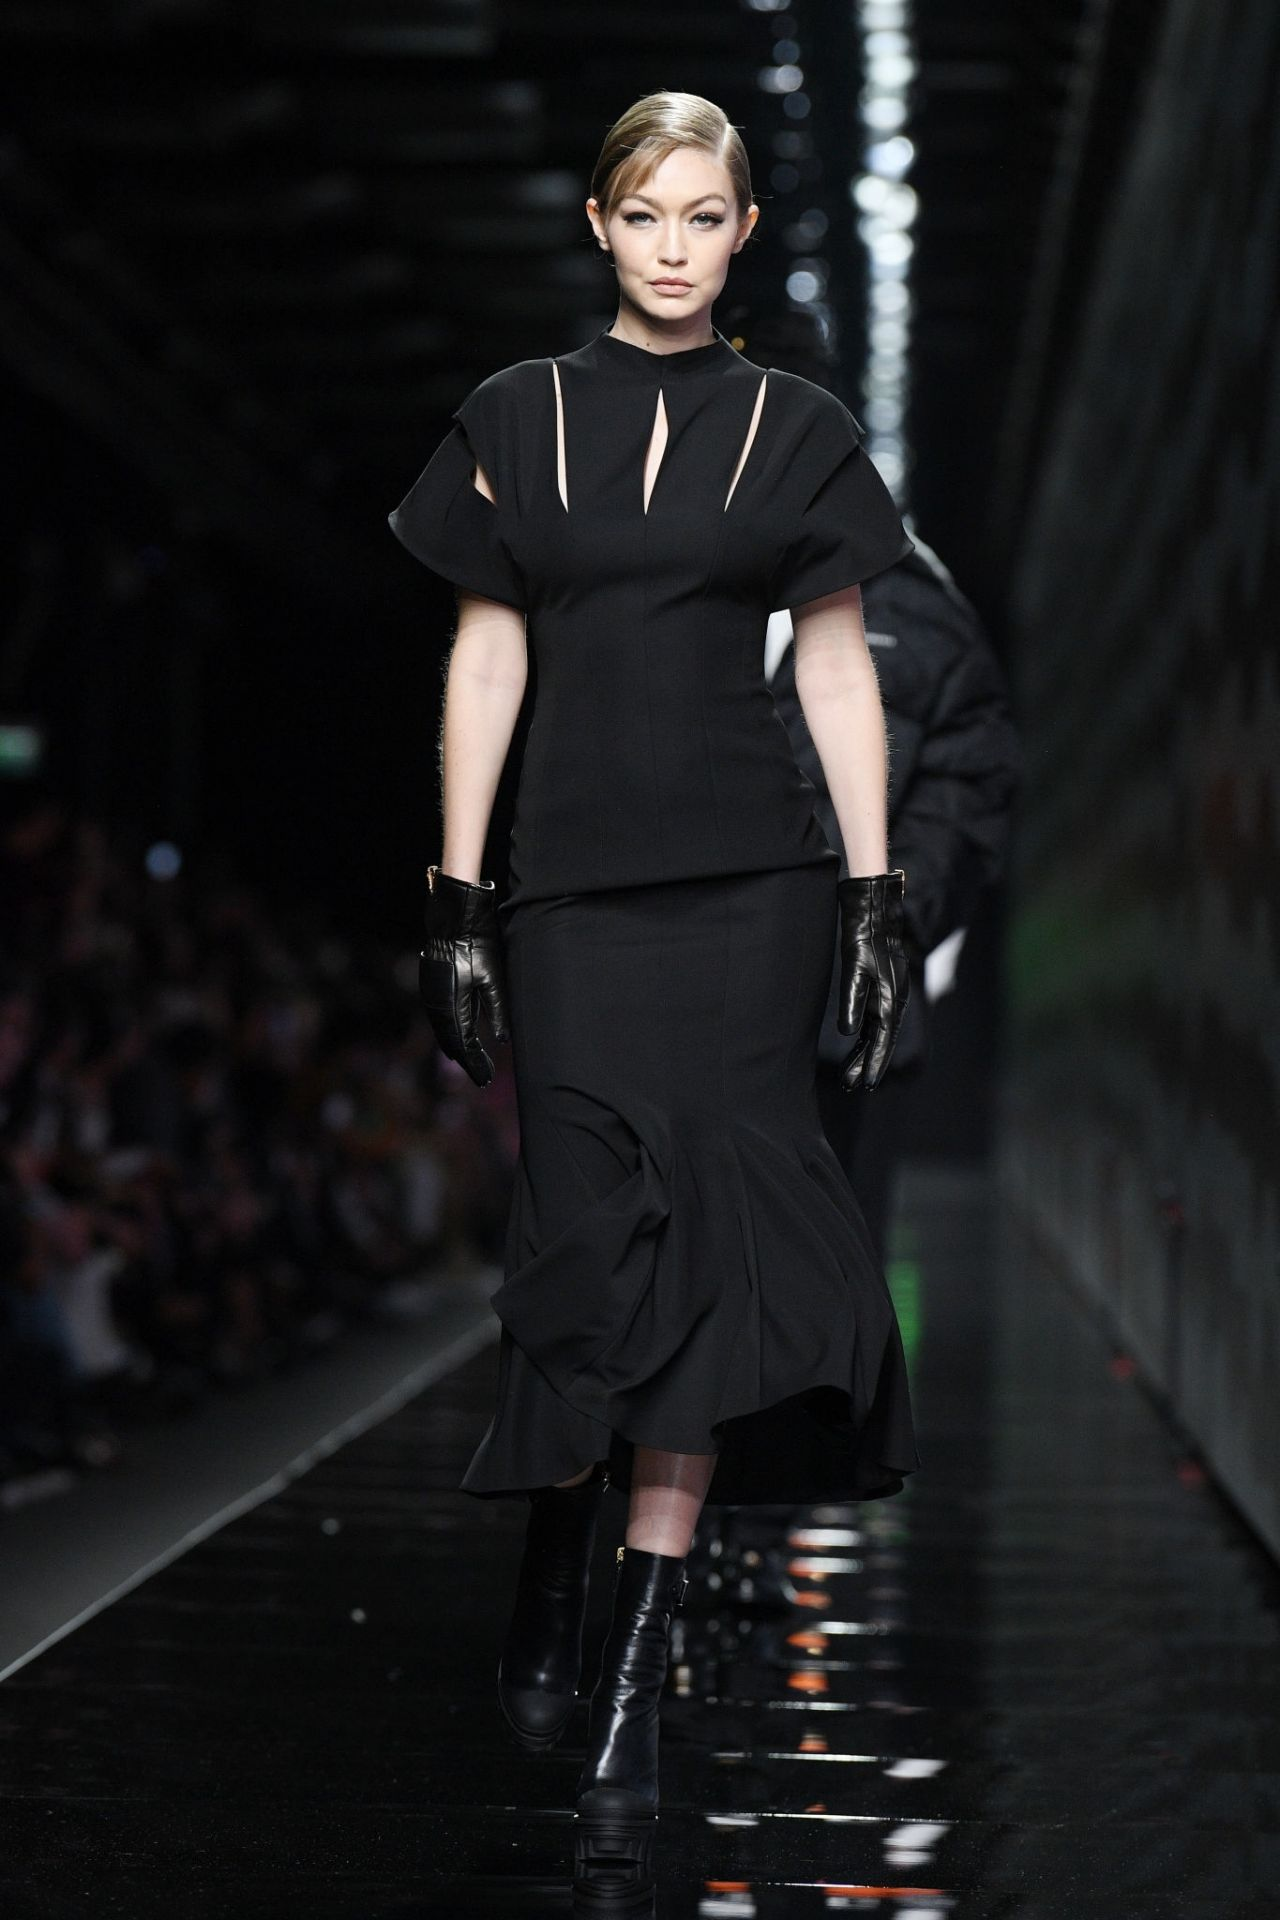 gigi-hadid-rocks-runway-versace-fall-winter-2020-2021-show-in-milan